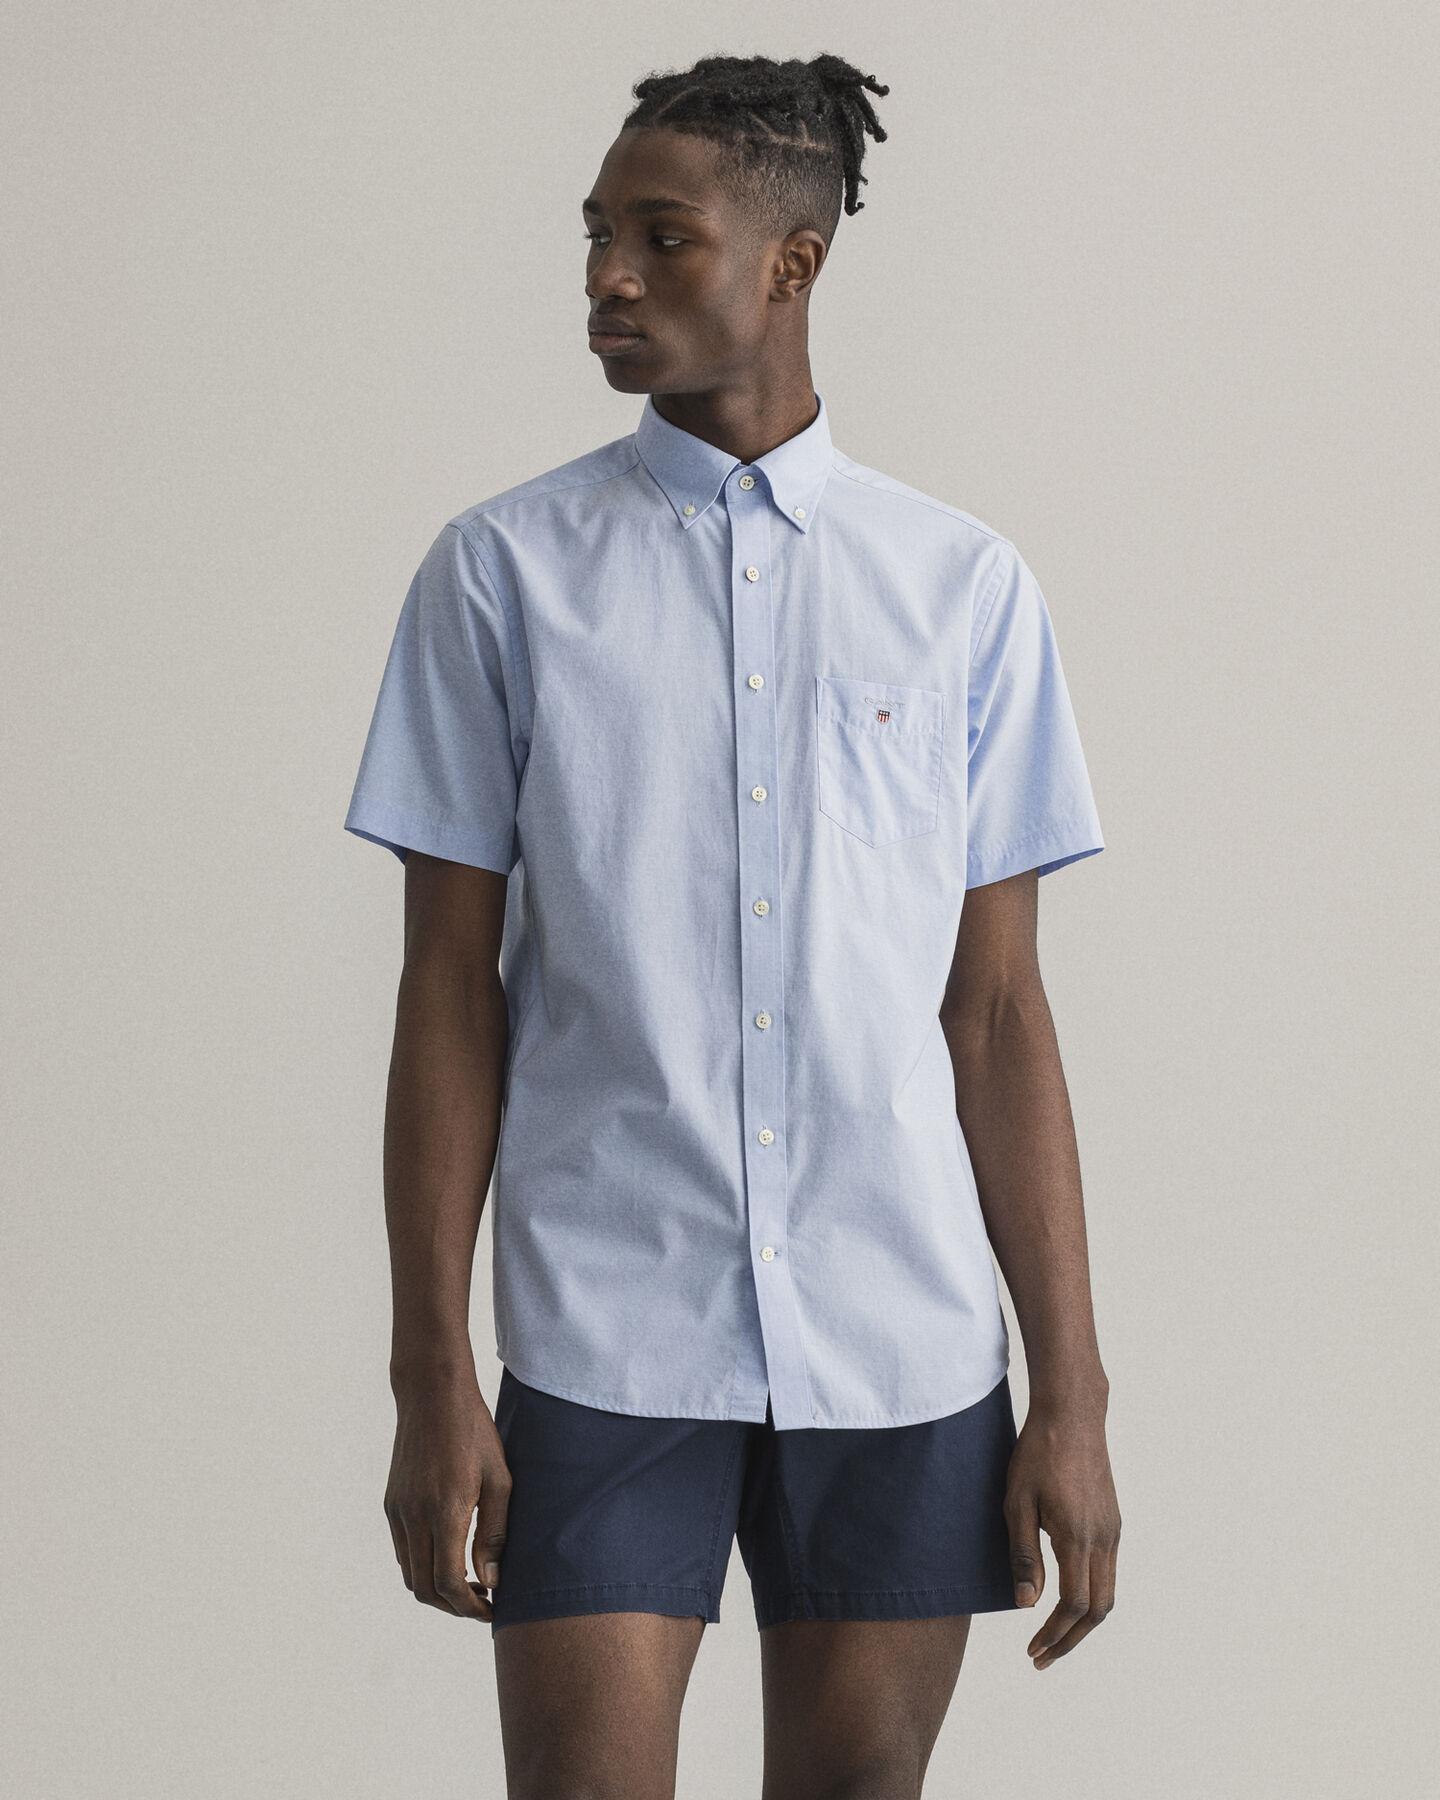 Regular Fit Broadcloth Kurzarm Hemd